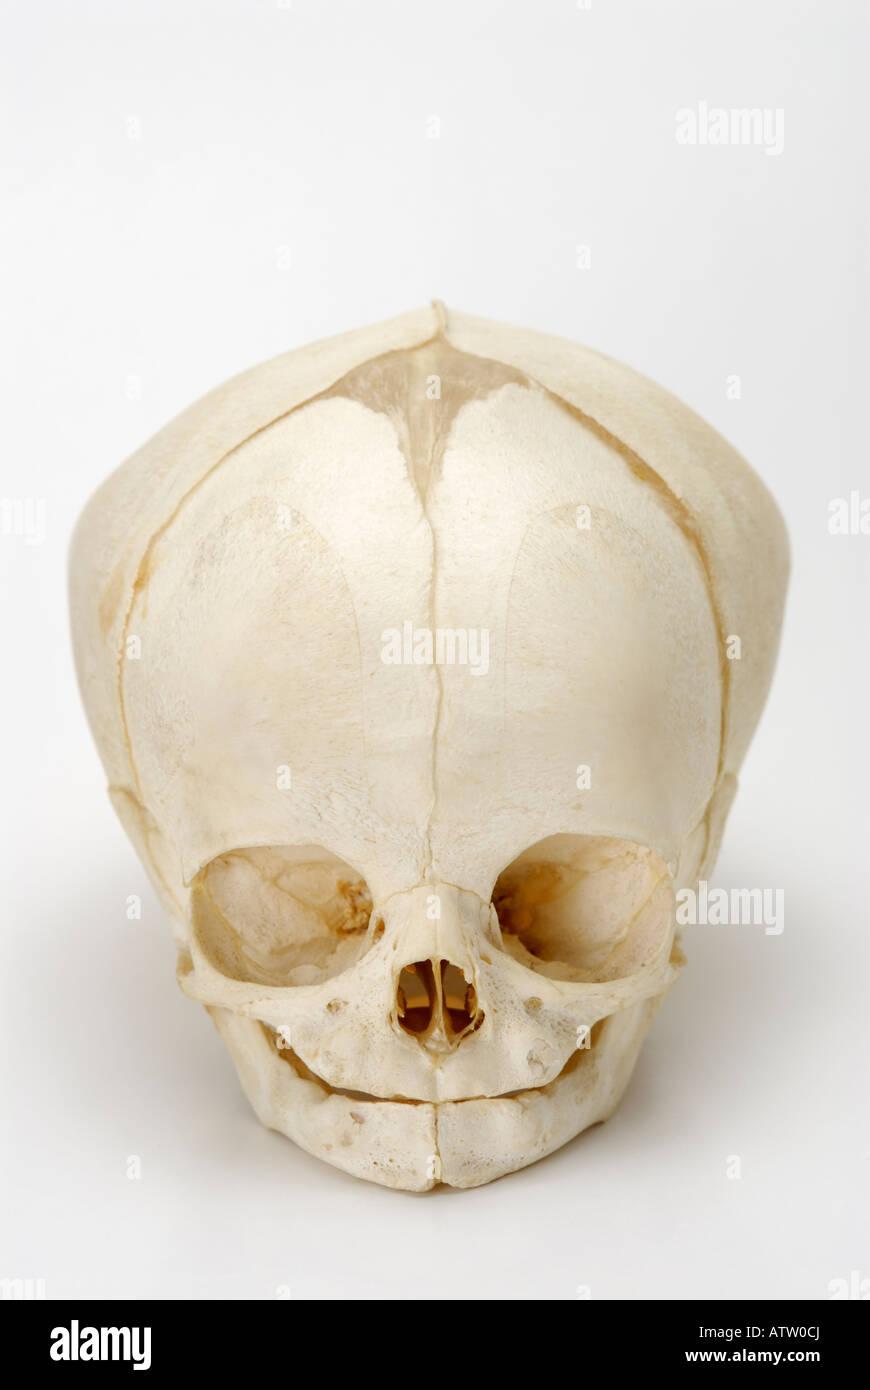 Skull from a full term human fetus foetus - Stock Image